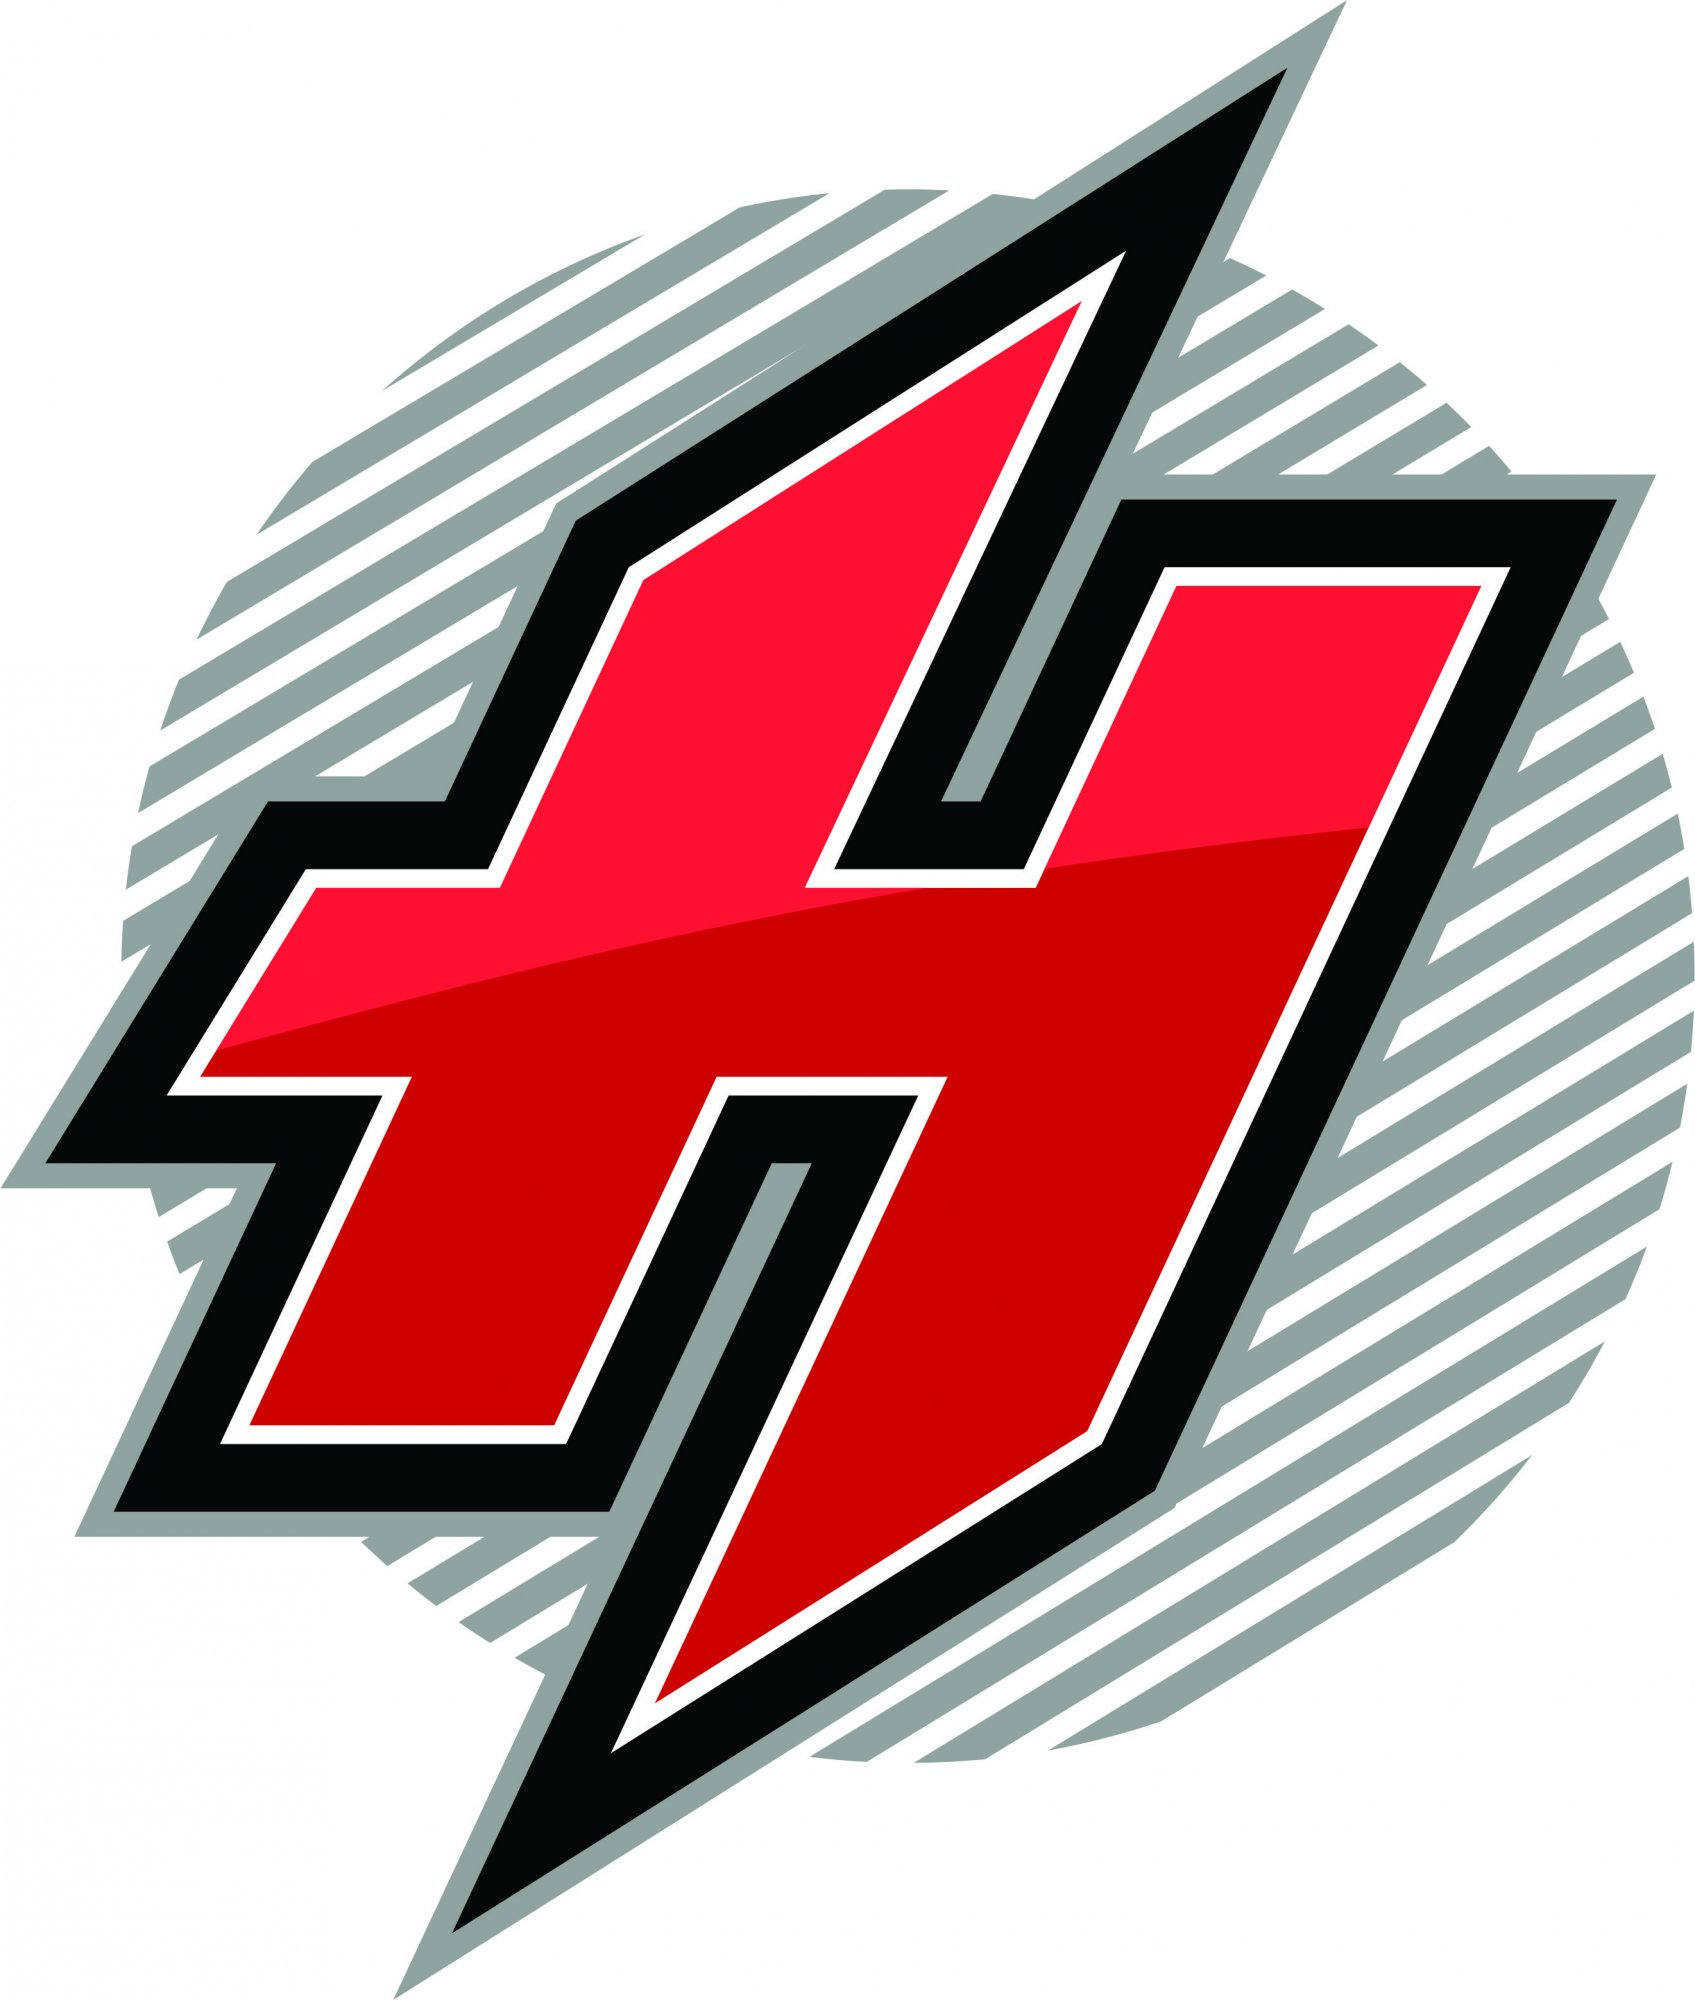 H logo Wallpaper